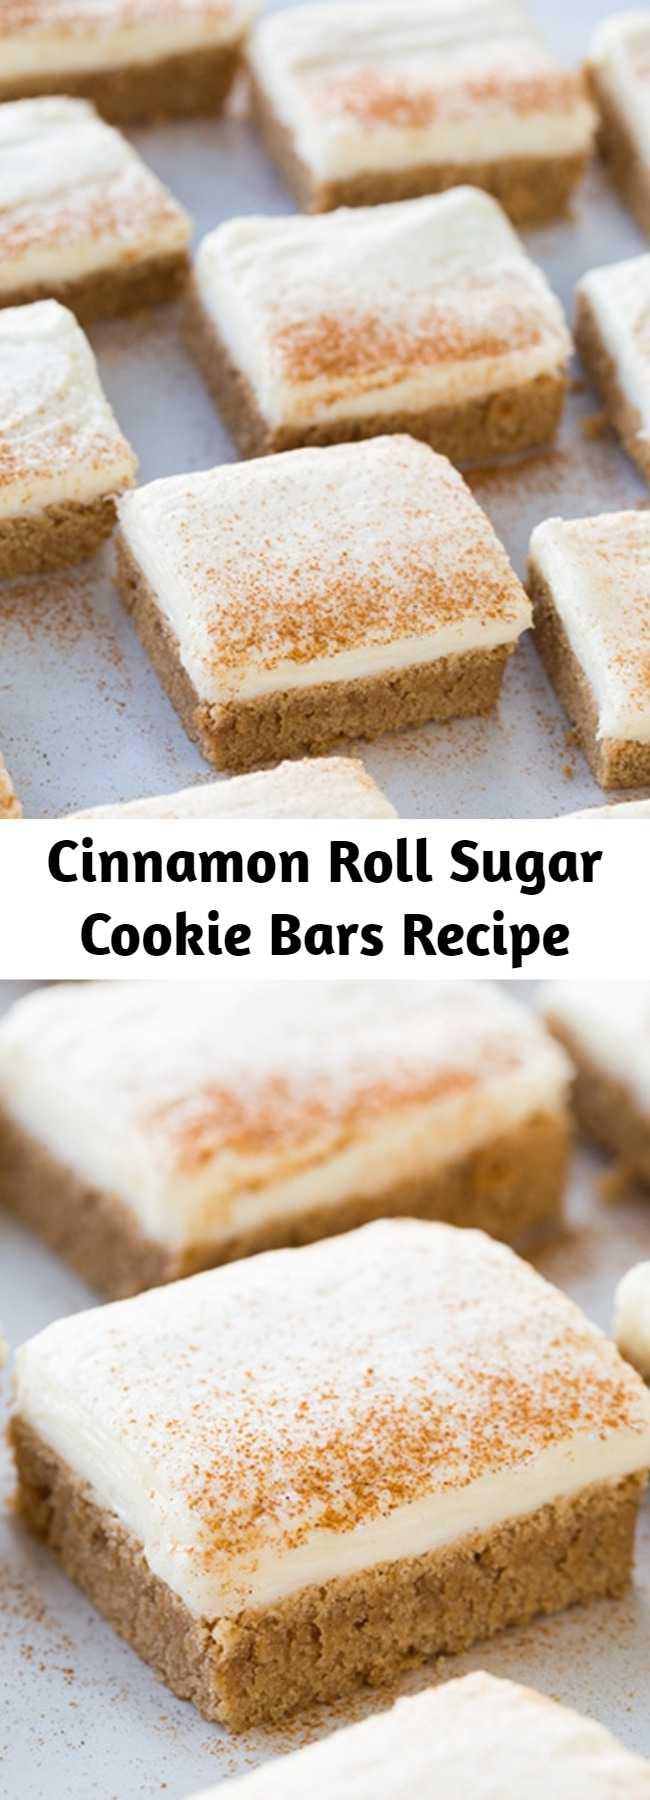 Cinnamon Roll Sugar Cookie Bars Recipe - Two tempting treats collide, sugar cookies and cinnamon rolls, something totally irresistible!